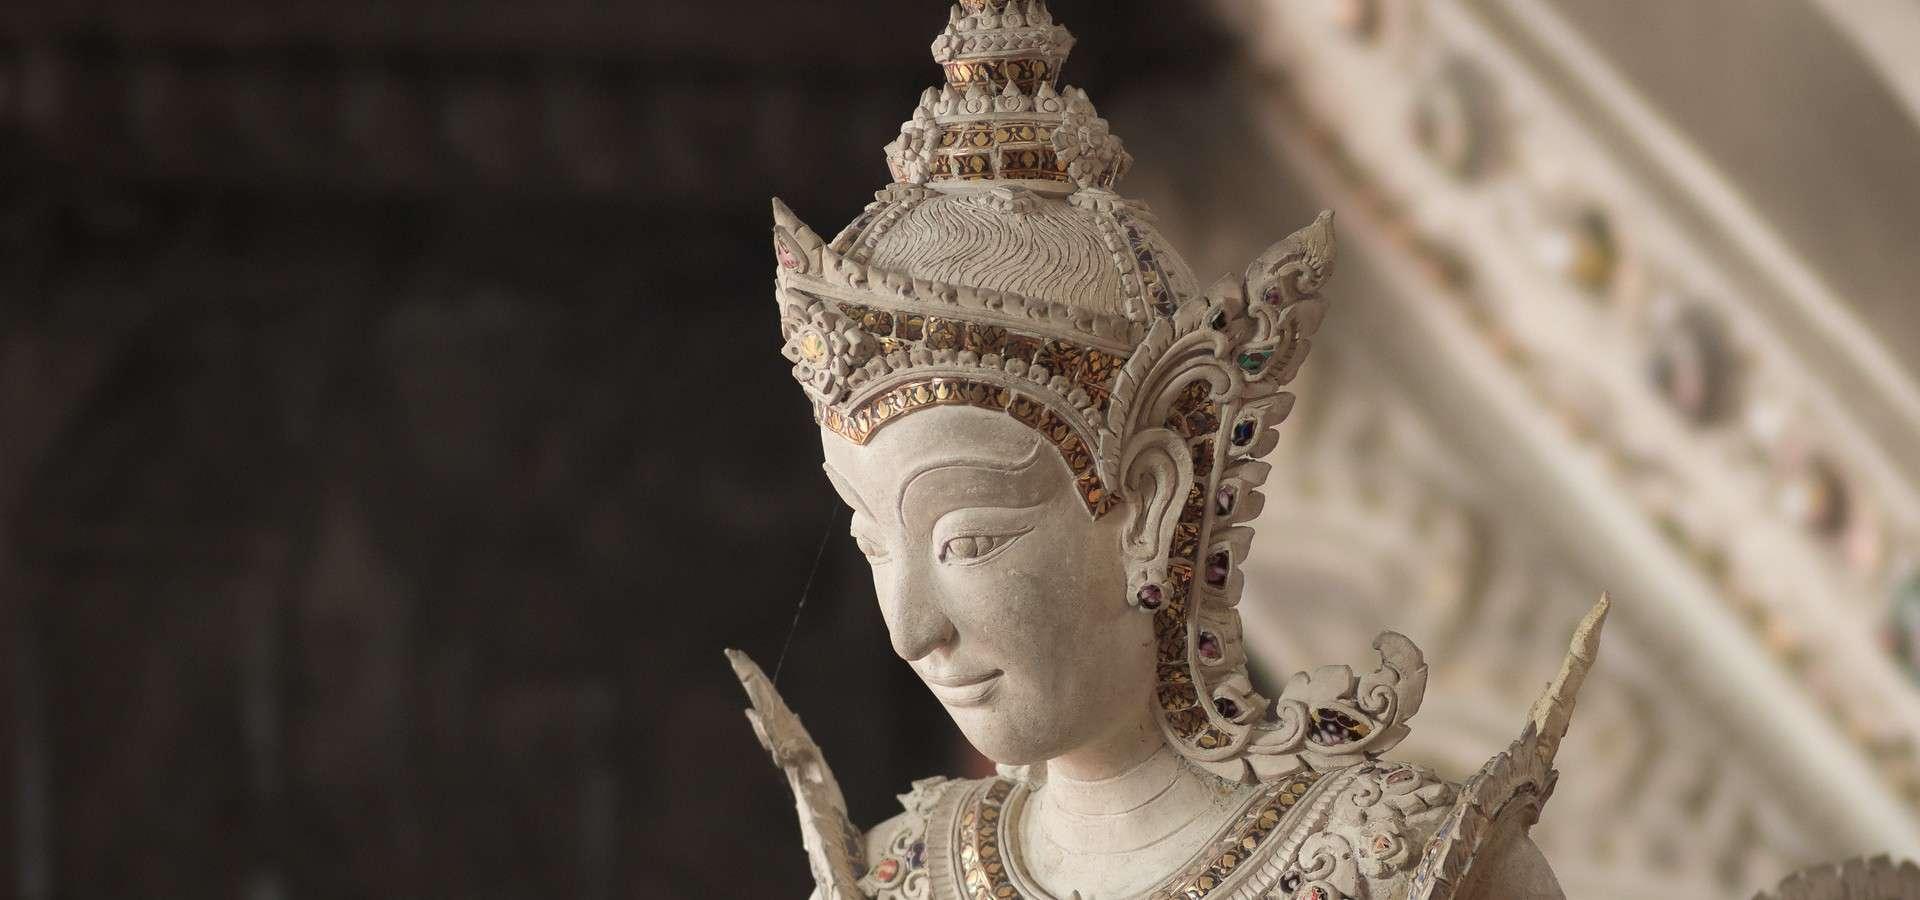 Boeddha beeld in Musea Bangkok